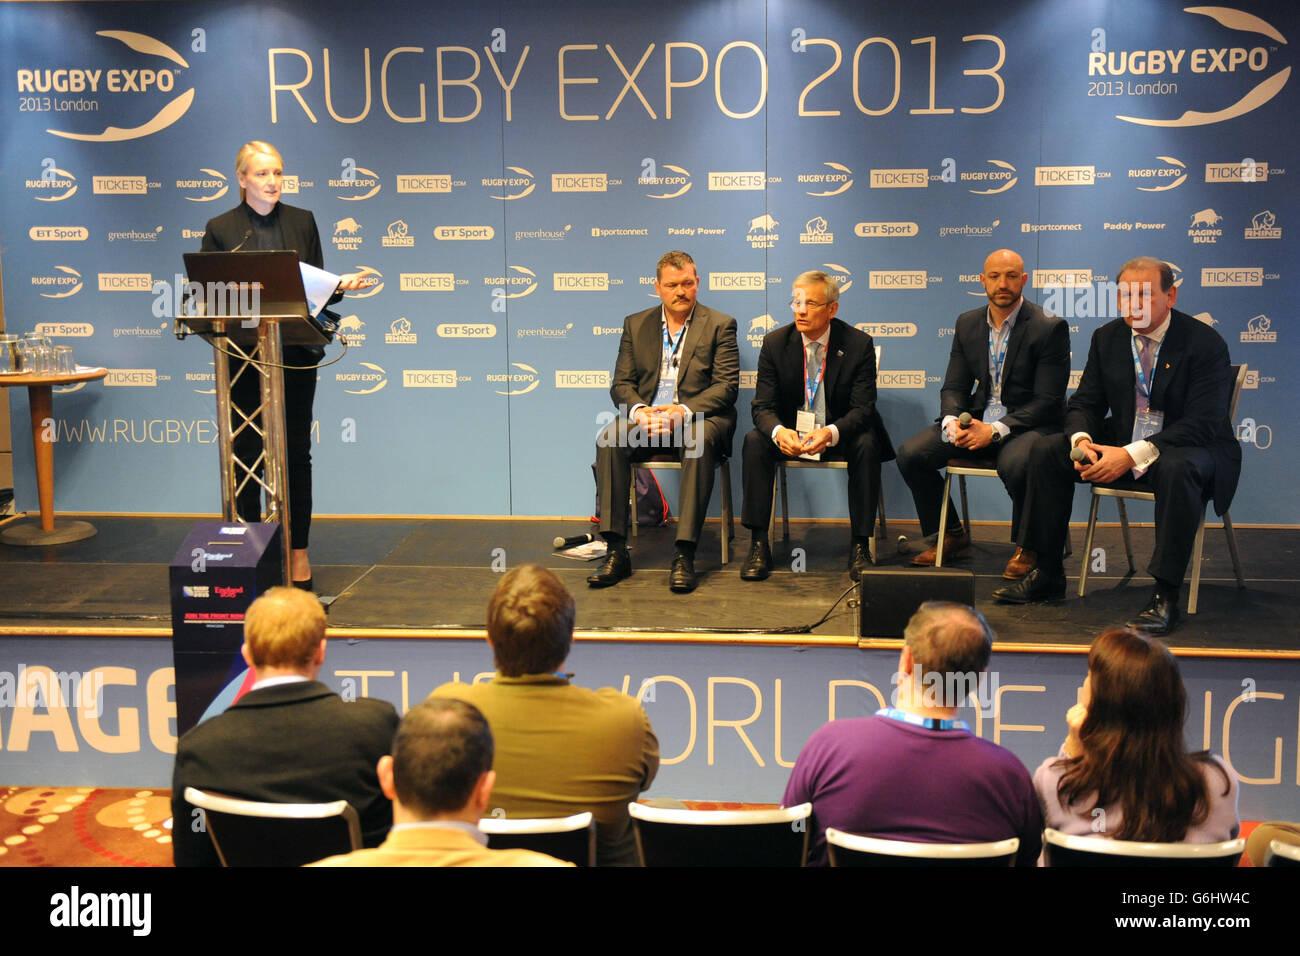 Rugby Expo 2013 - Day Two - Twickenham Stadium - Stock Image